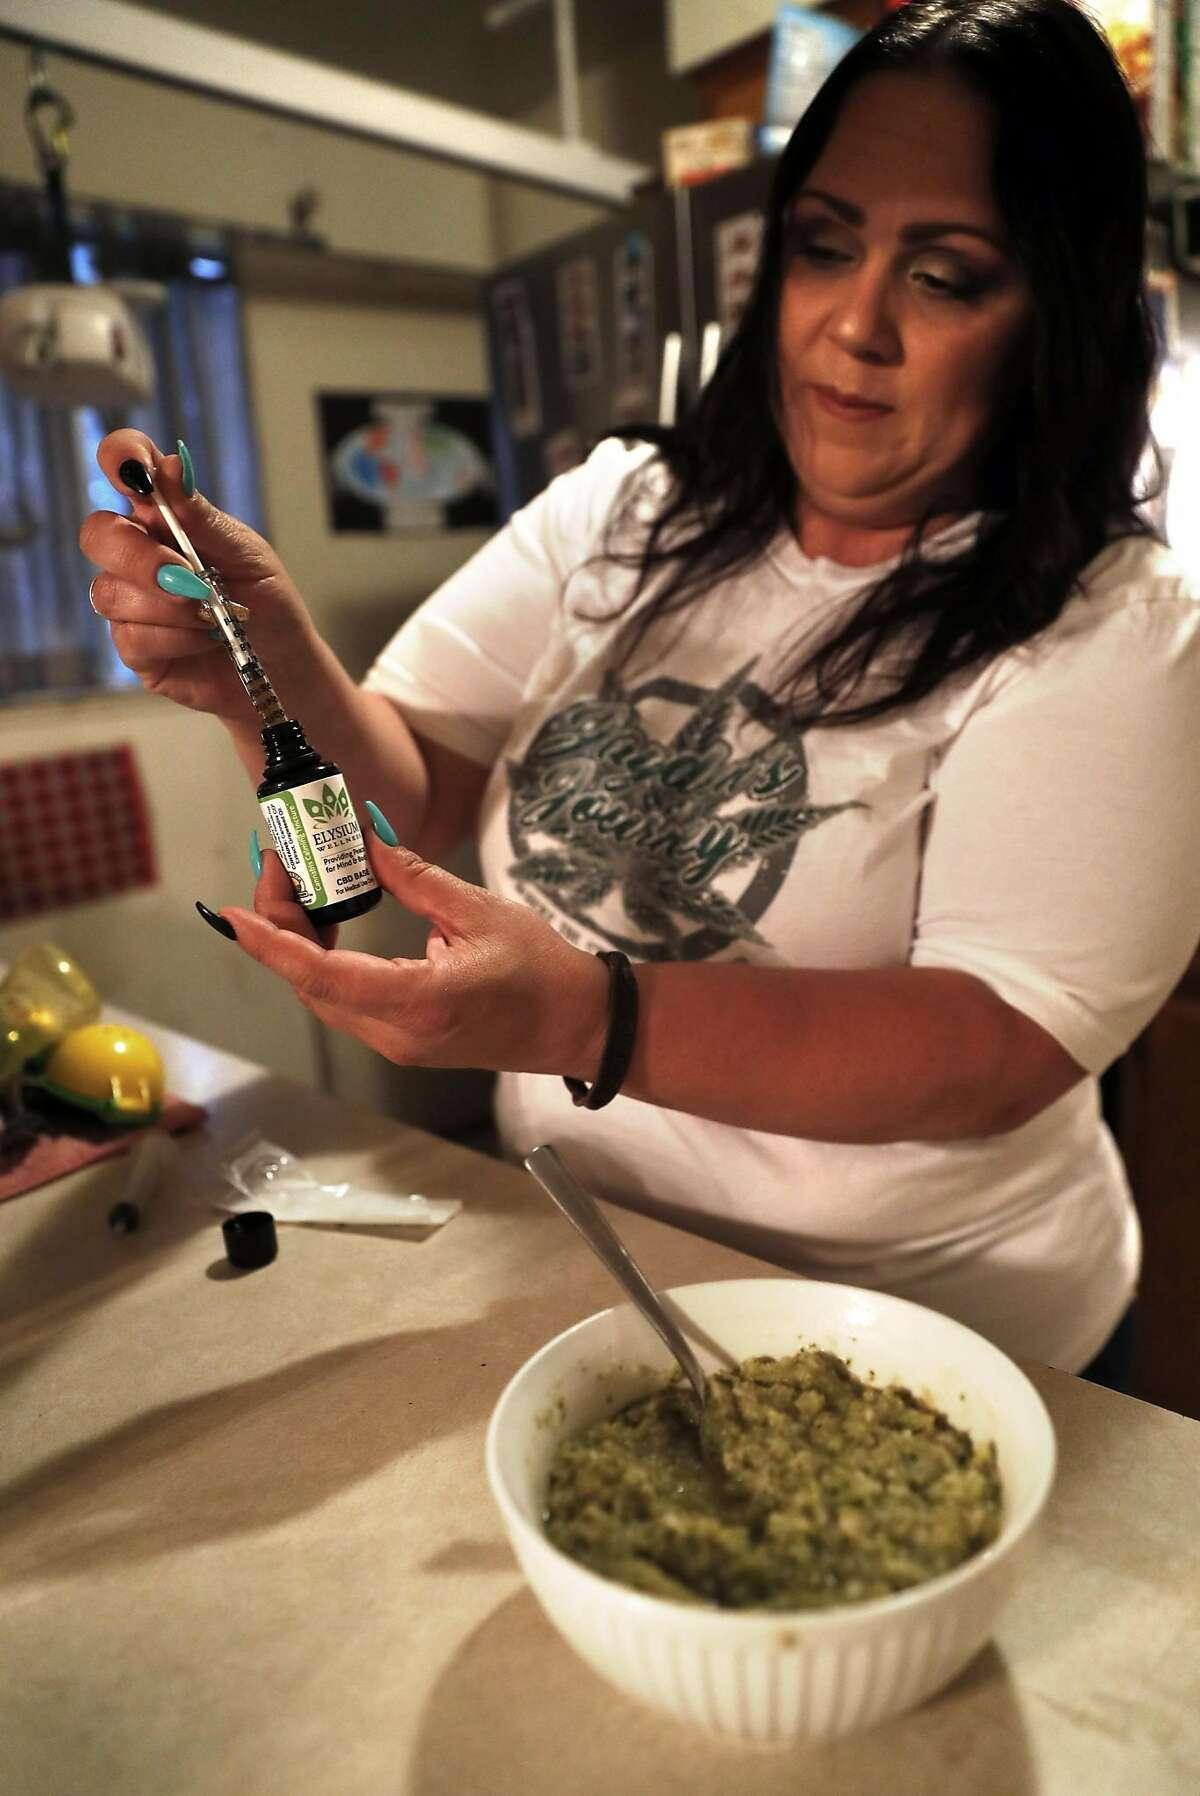 Karina Garcia prepares to administer medical marijuana to her son, JoJo, at their home in San Bruno, Calif. on Monday, August 20, 2018.